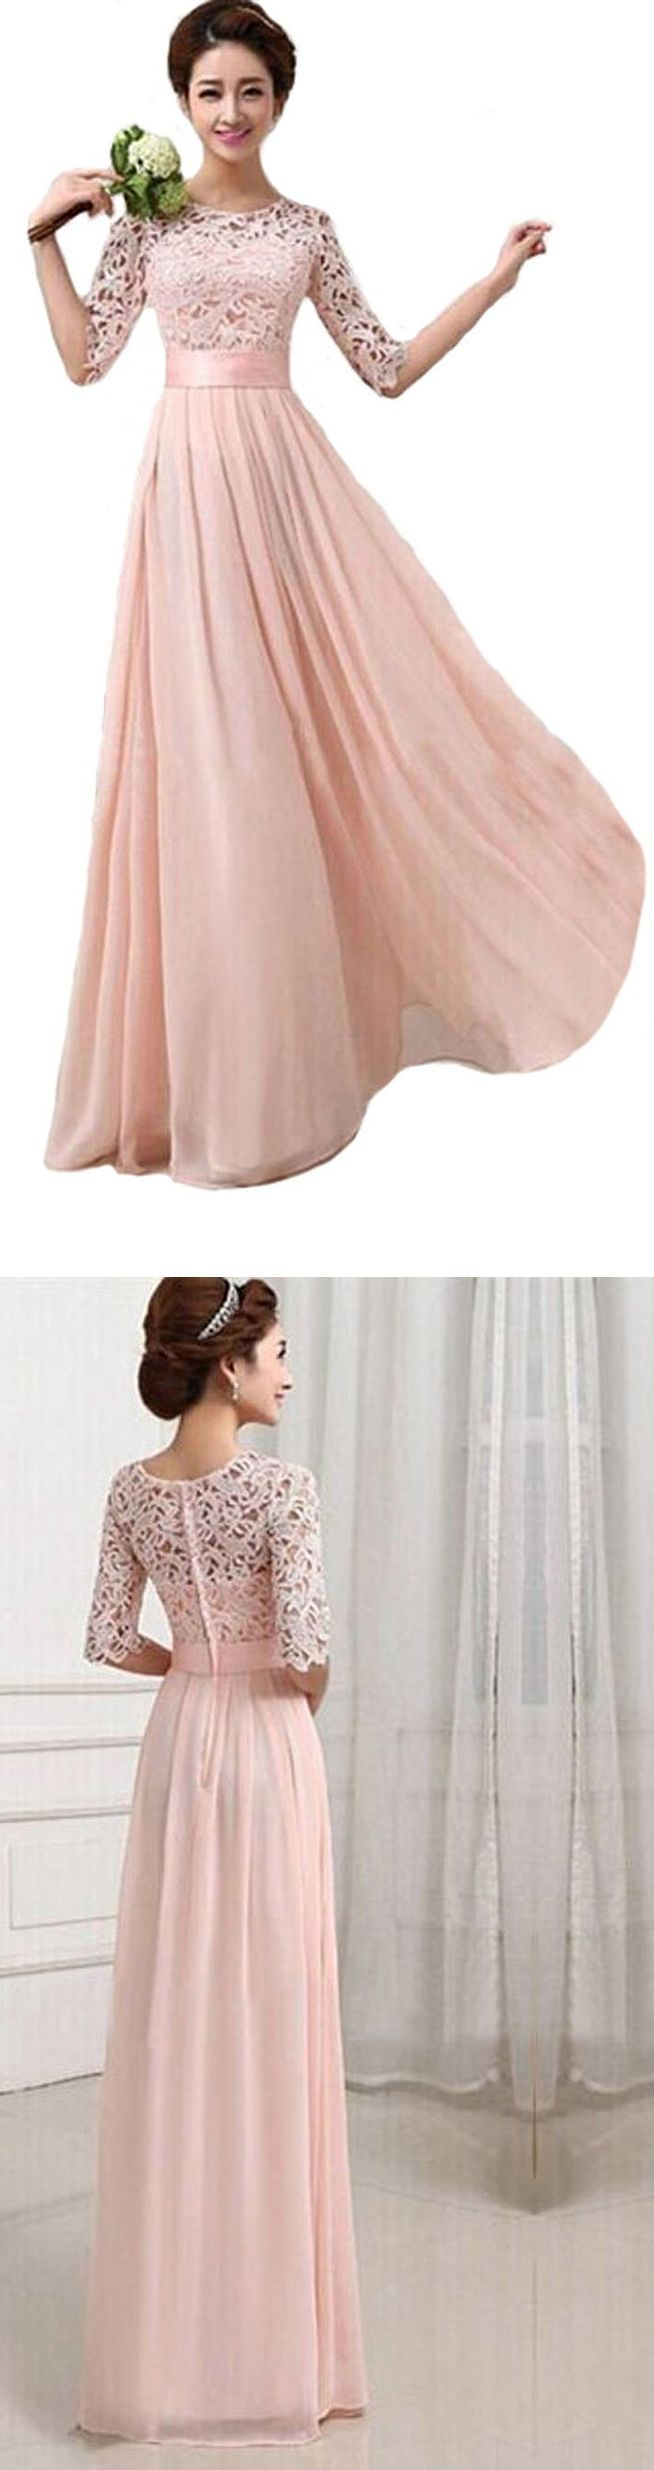 Mejores 545 imágenes de Bridesmaid Dresses en Pinterest | Damas de ...